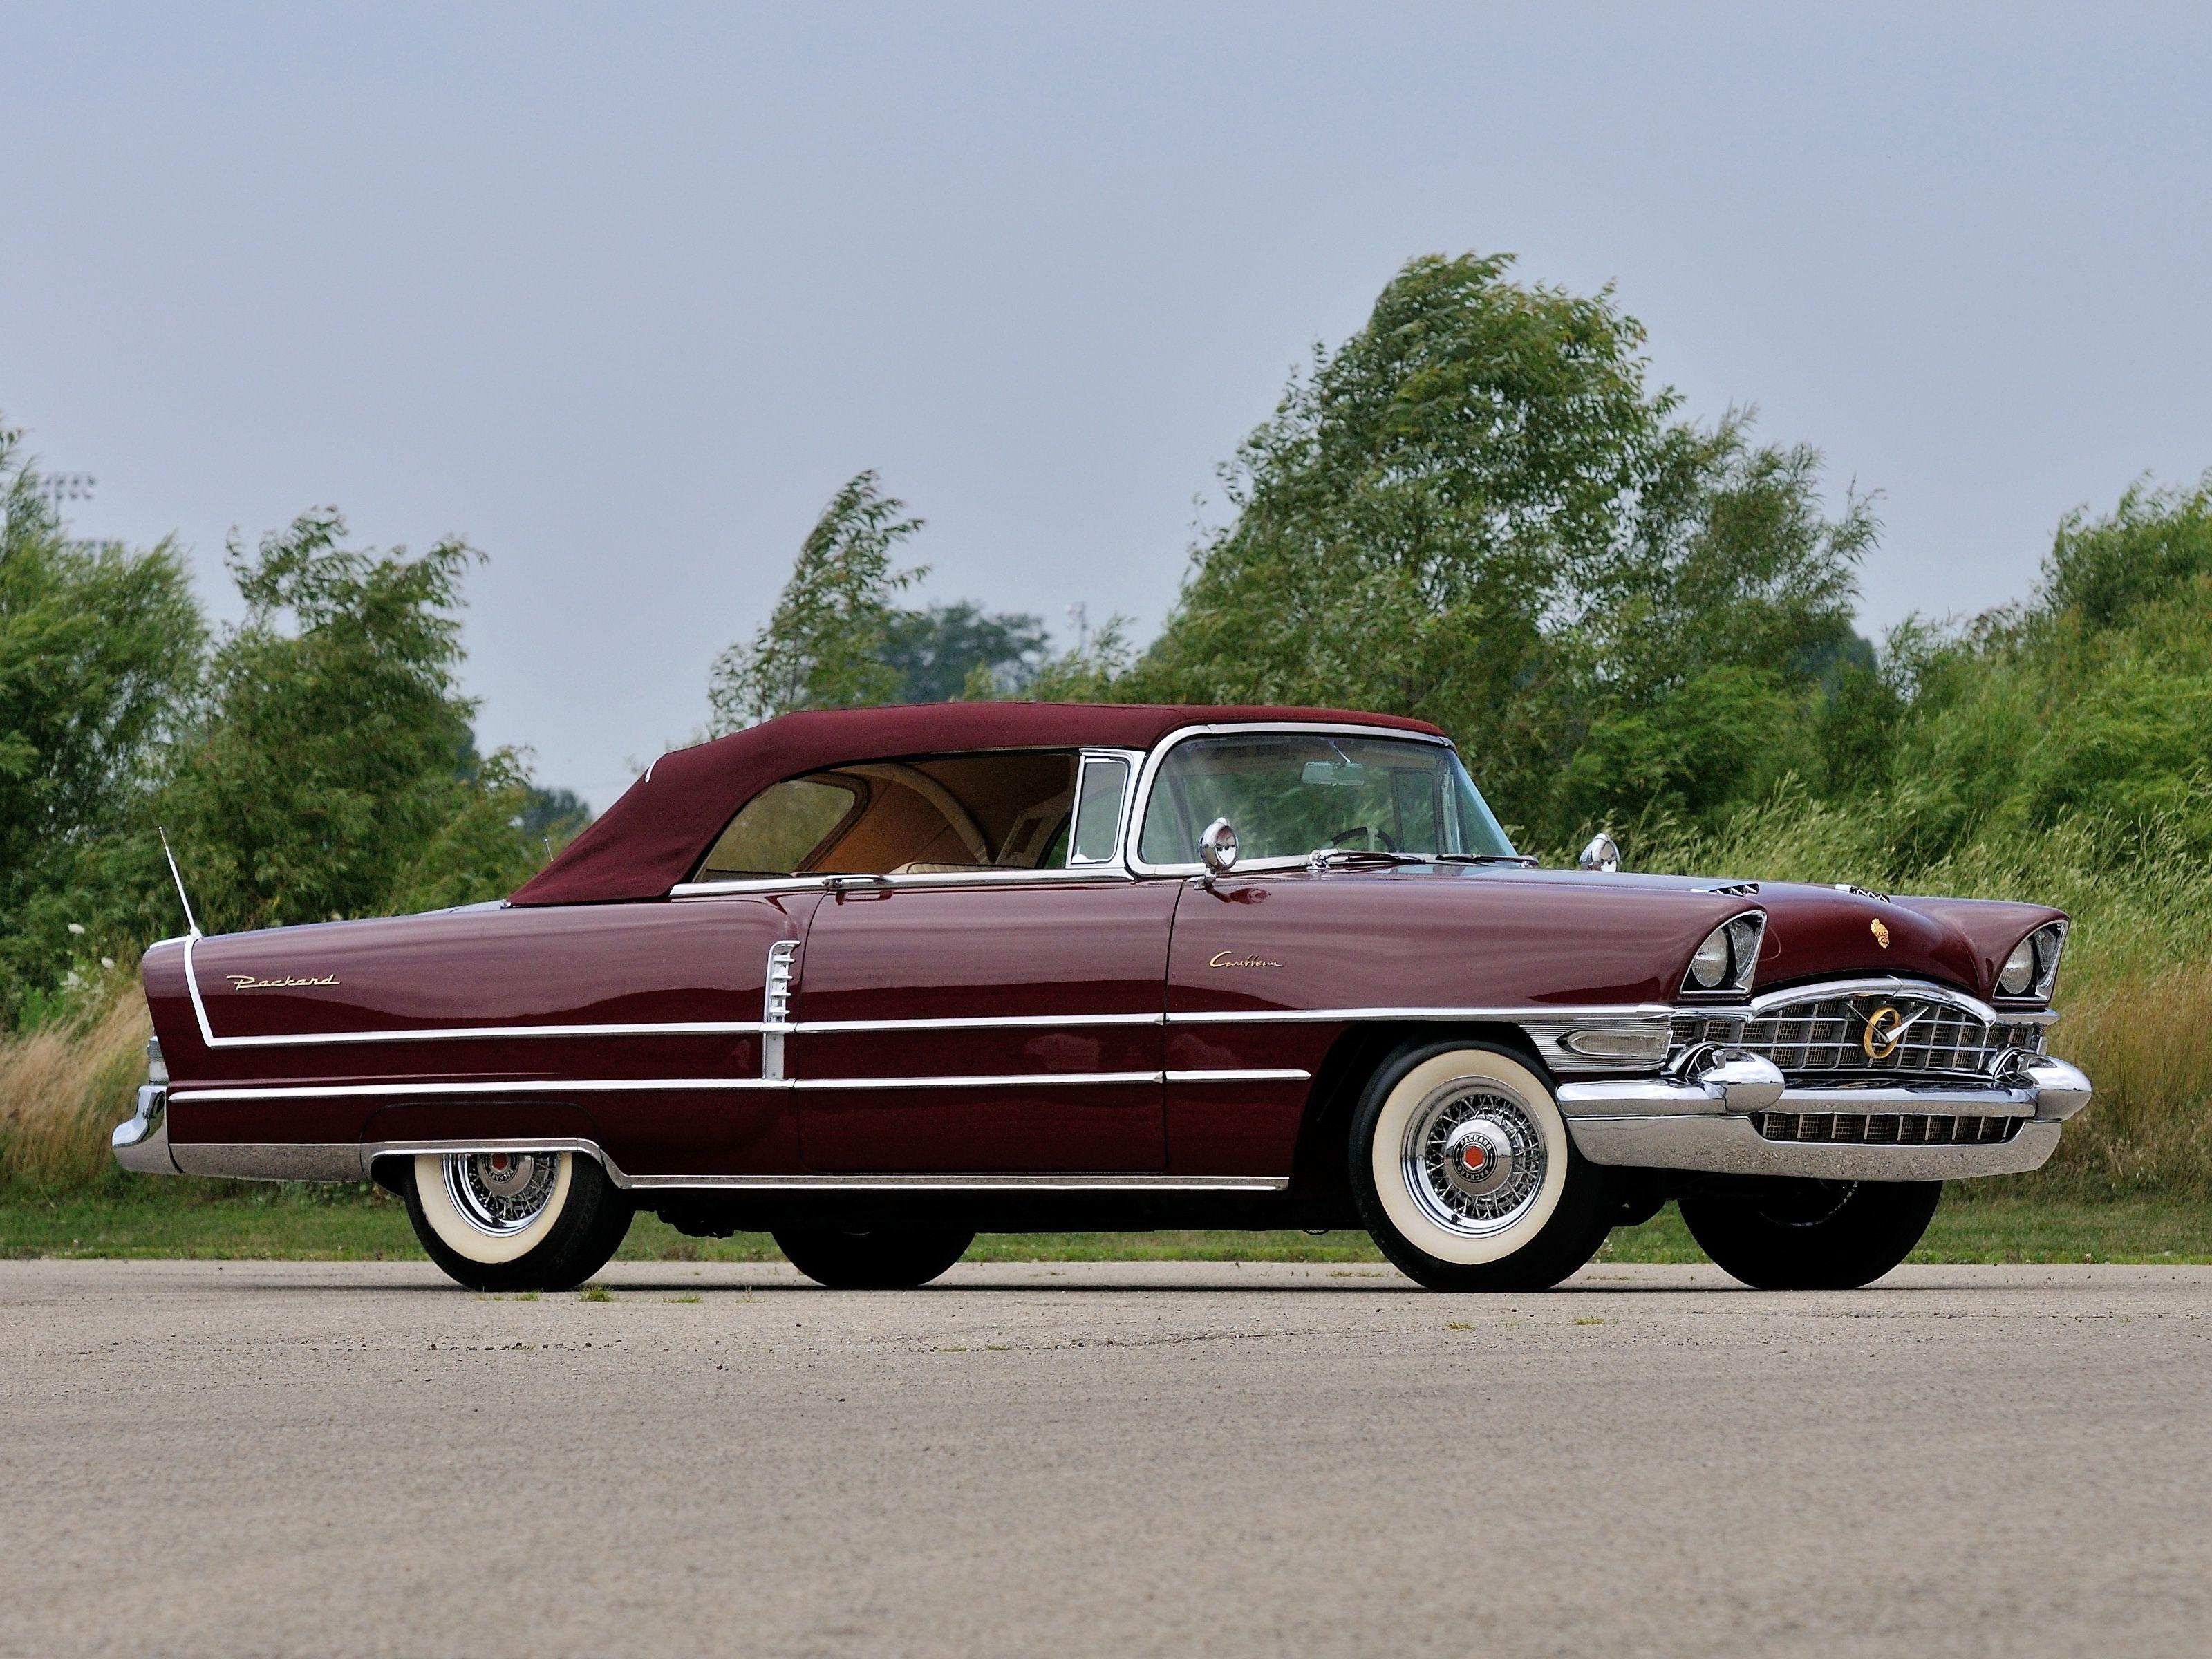 1956 Packard Caribbean Custom Convertible Packard cars